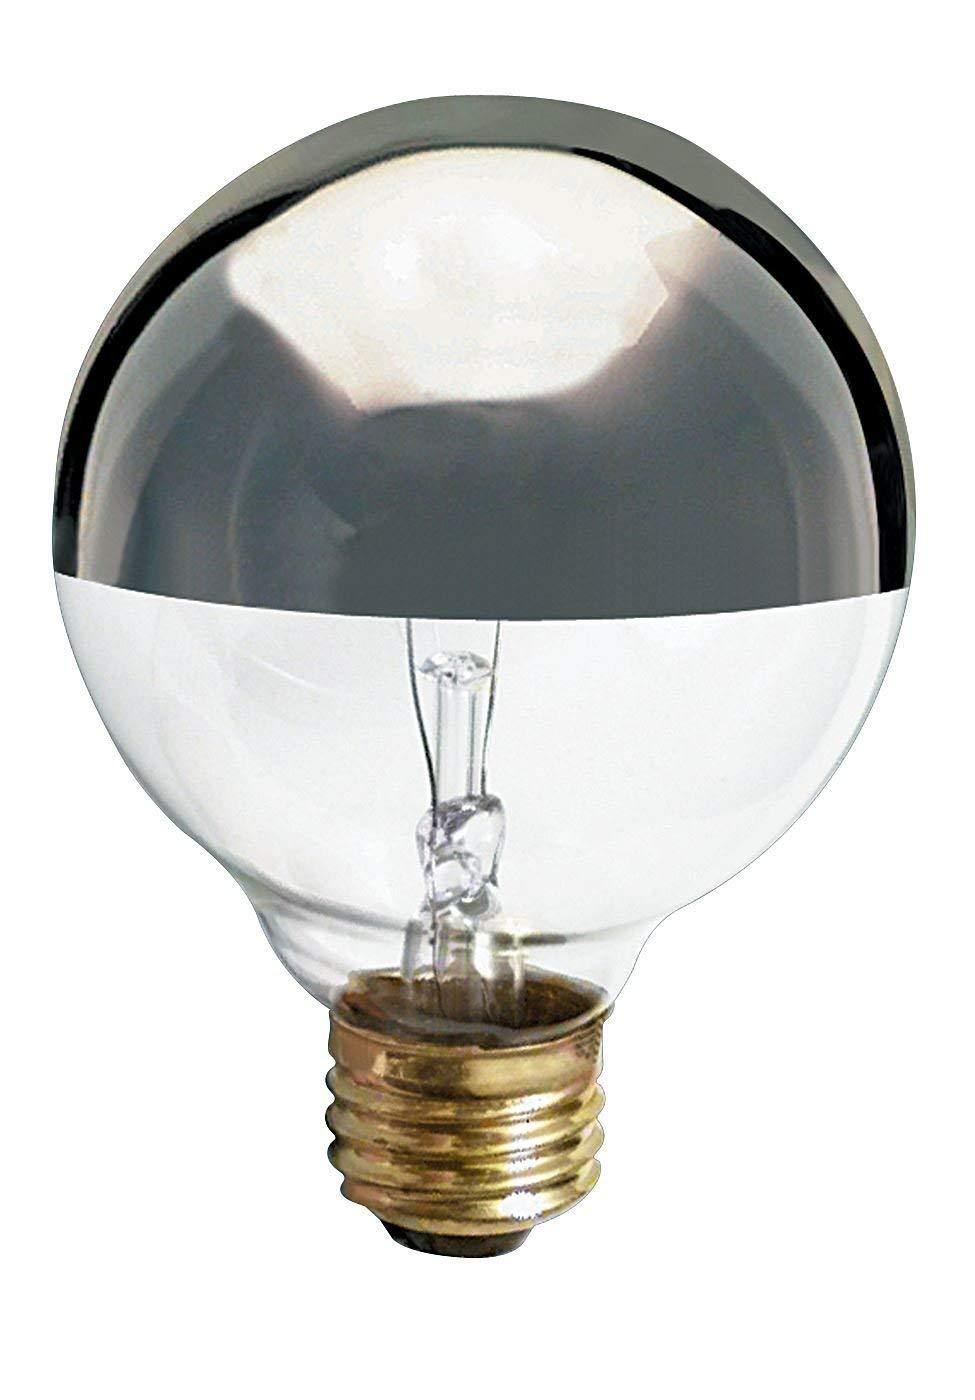 Satco 25G25/SL Incandescent Globe Light, 25W E26 G25, Silver Crown Bulb [Pack of 24]